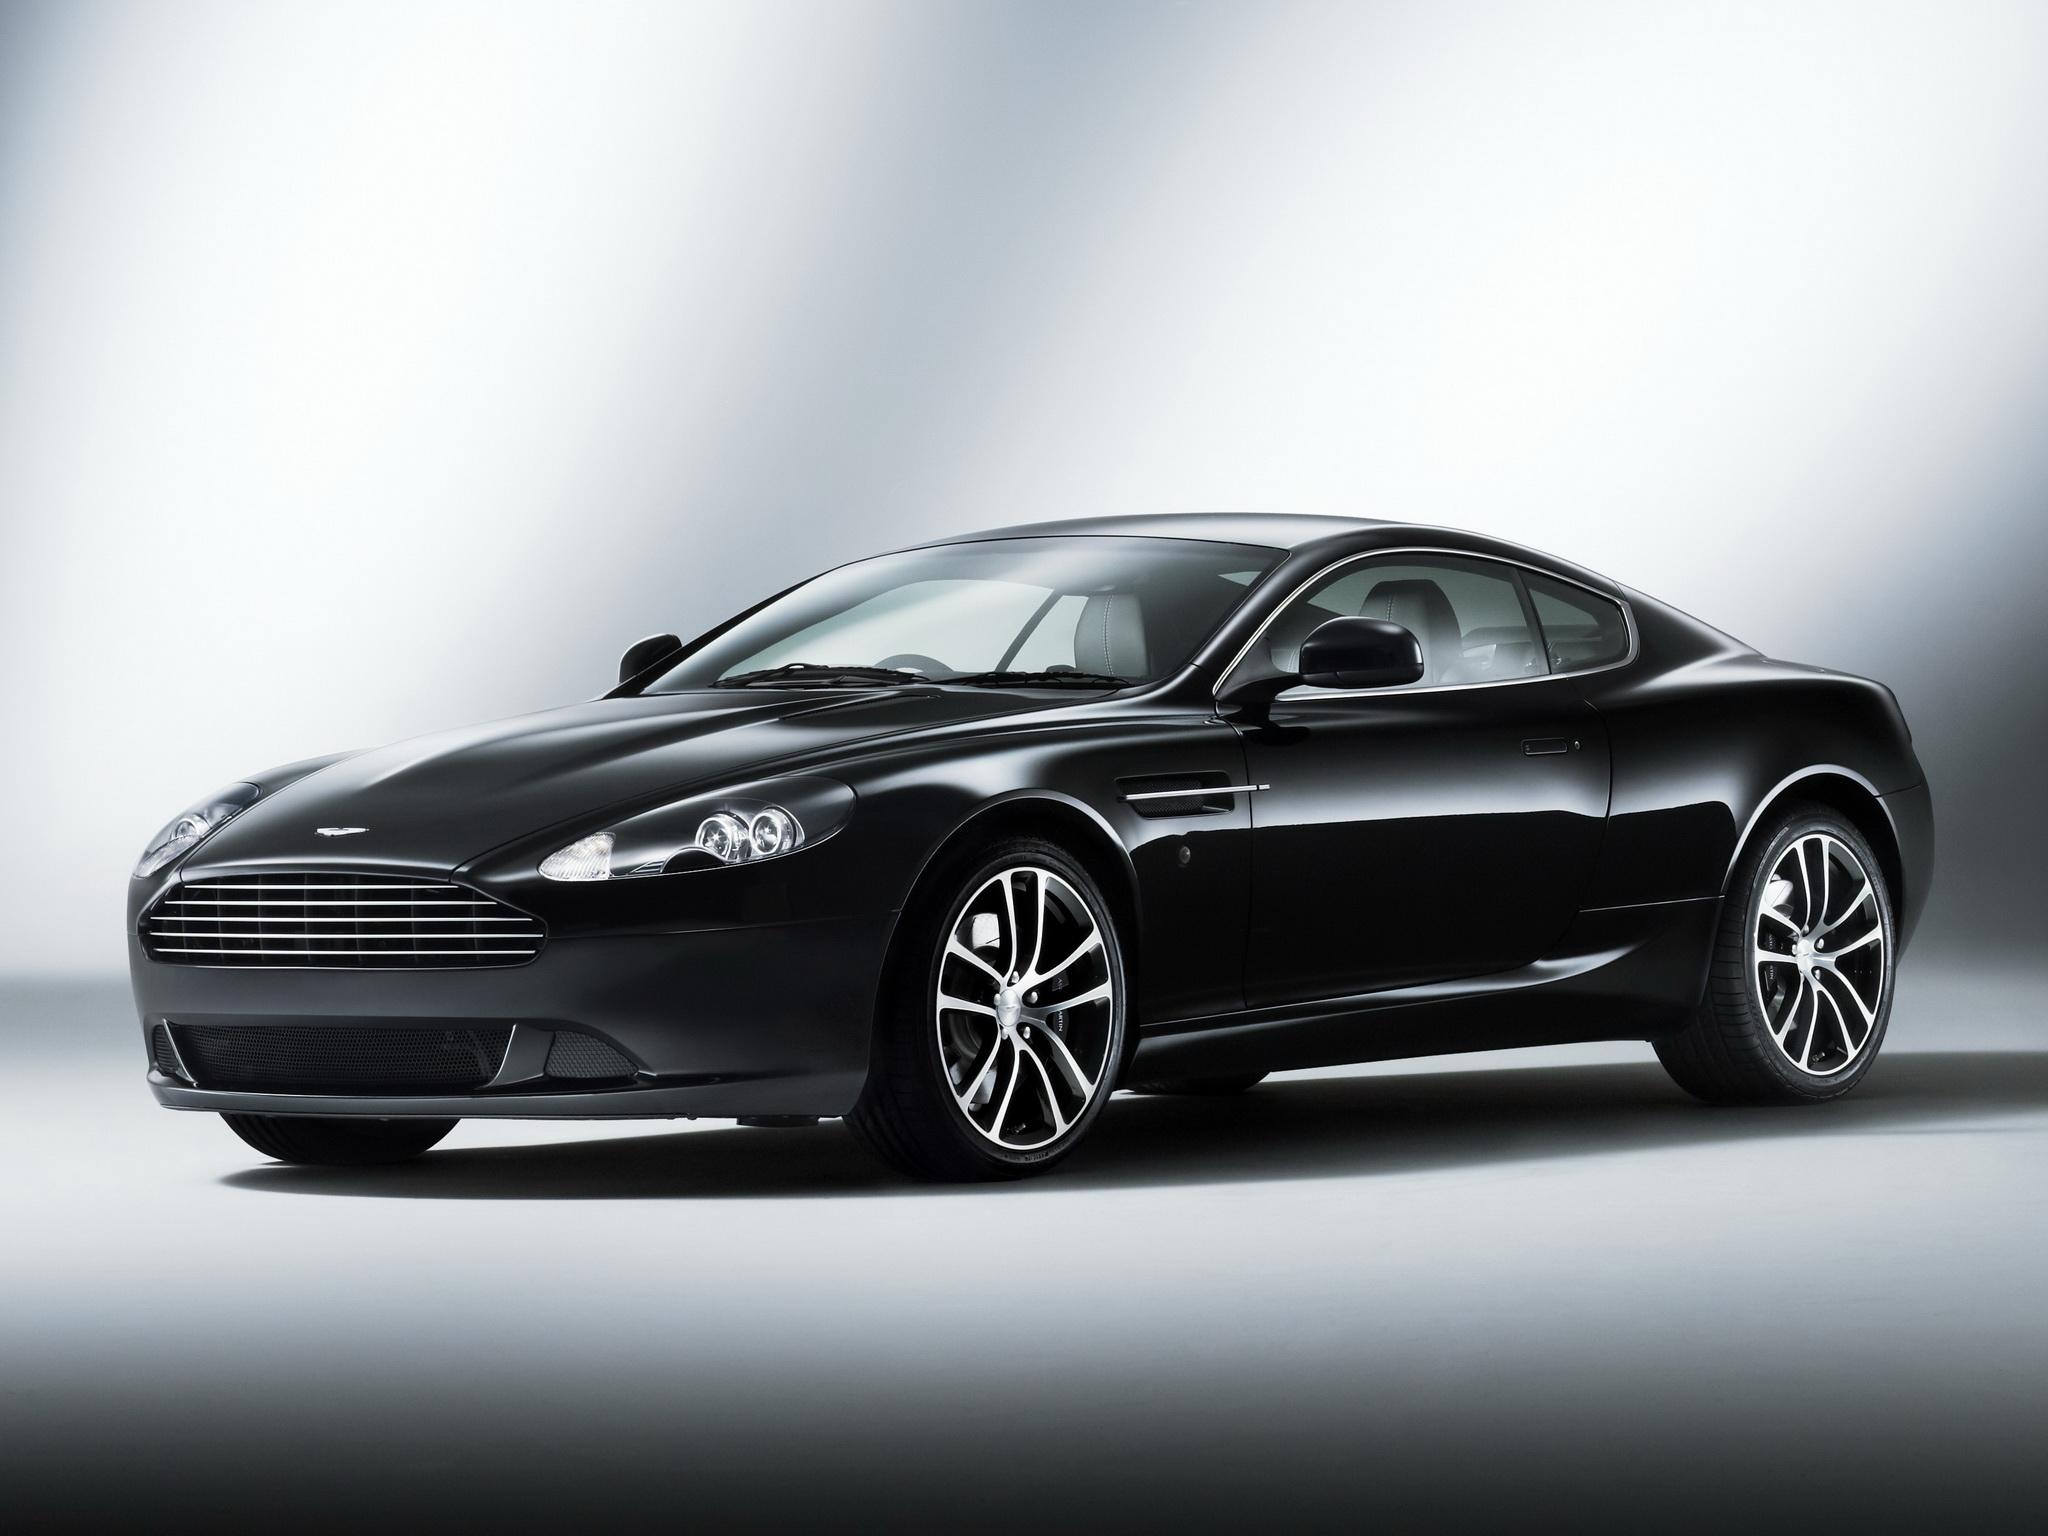 Aston Martin DB9 Carbon Black Wallpapers Car wallpapers HD 2048x1536